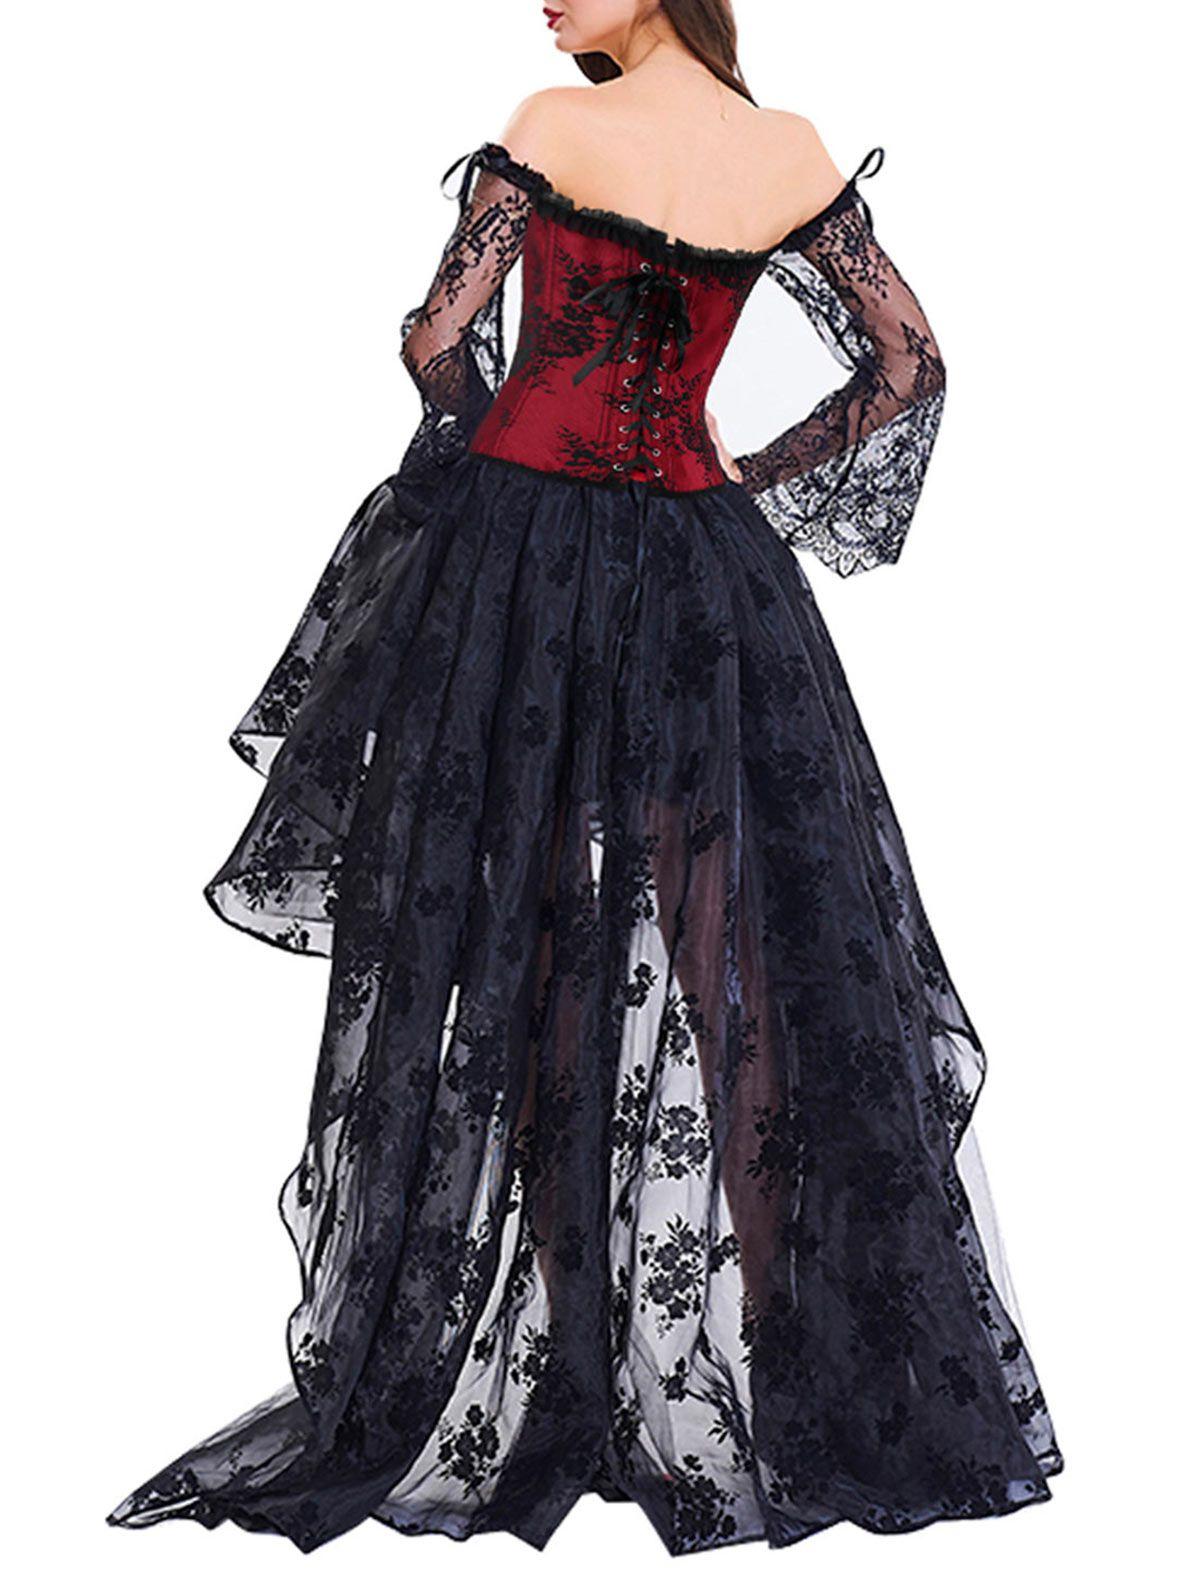 Vestido Renda Corset Manga Flare